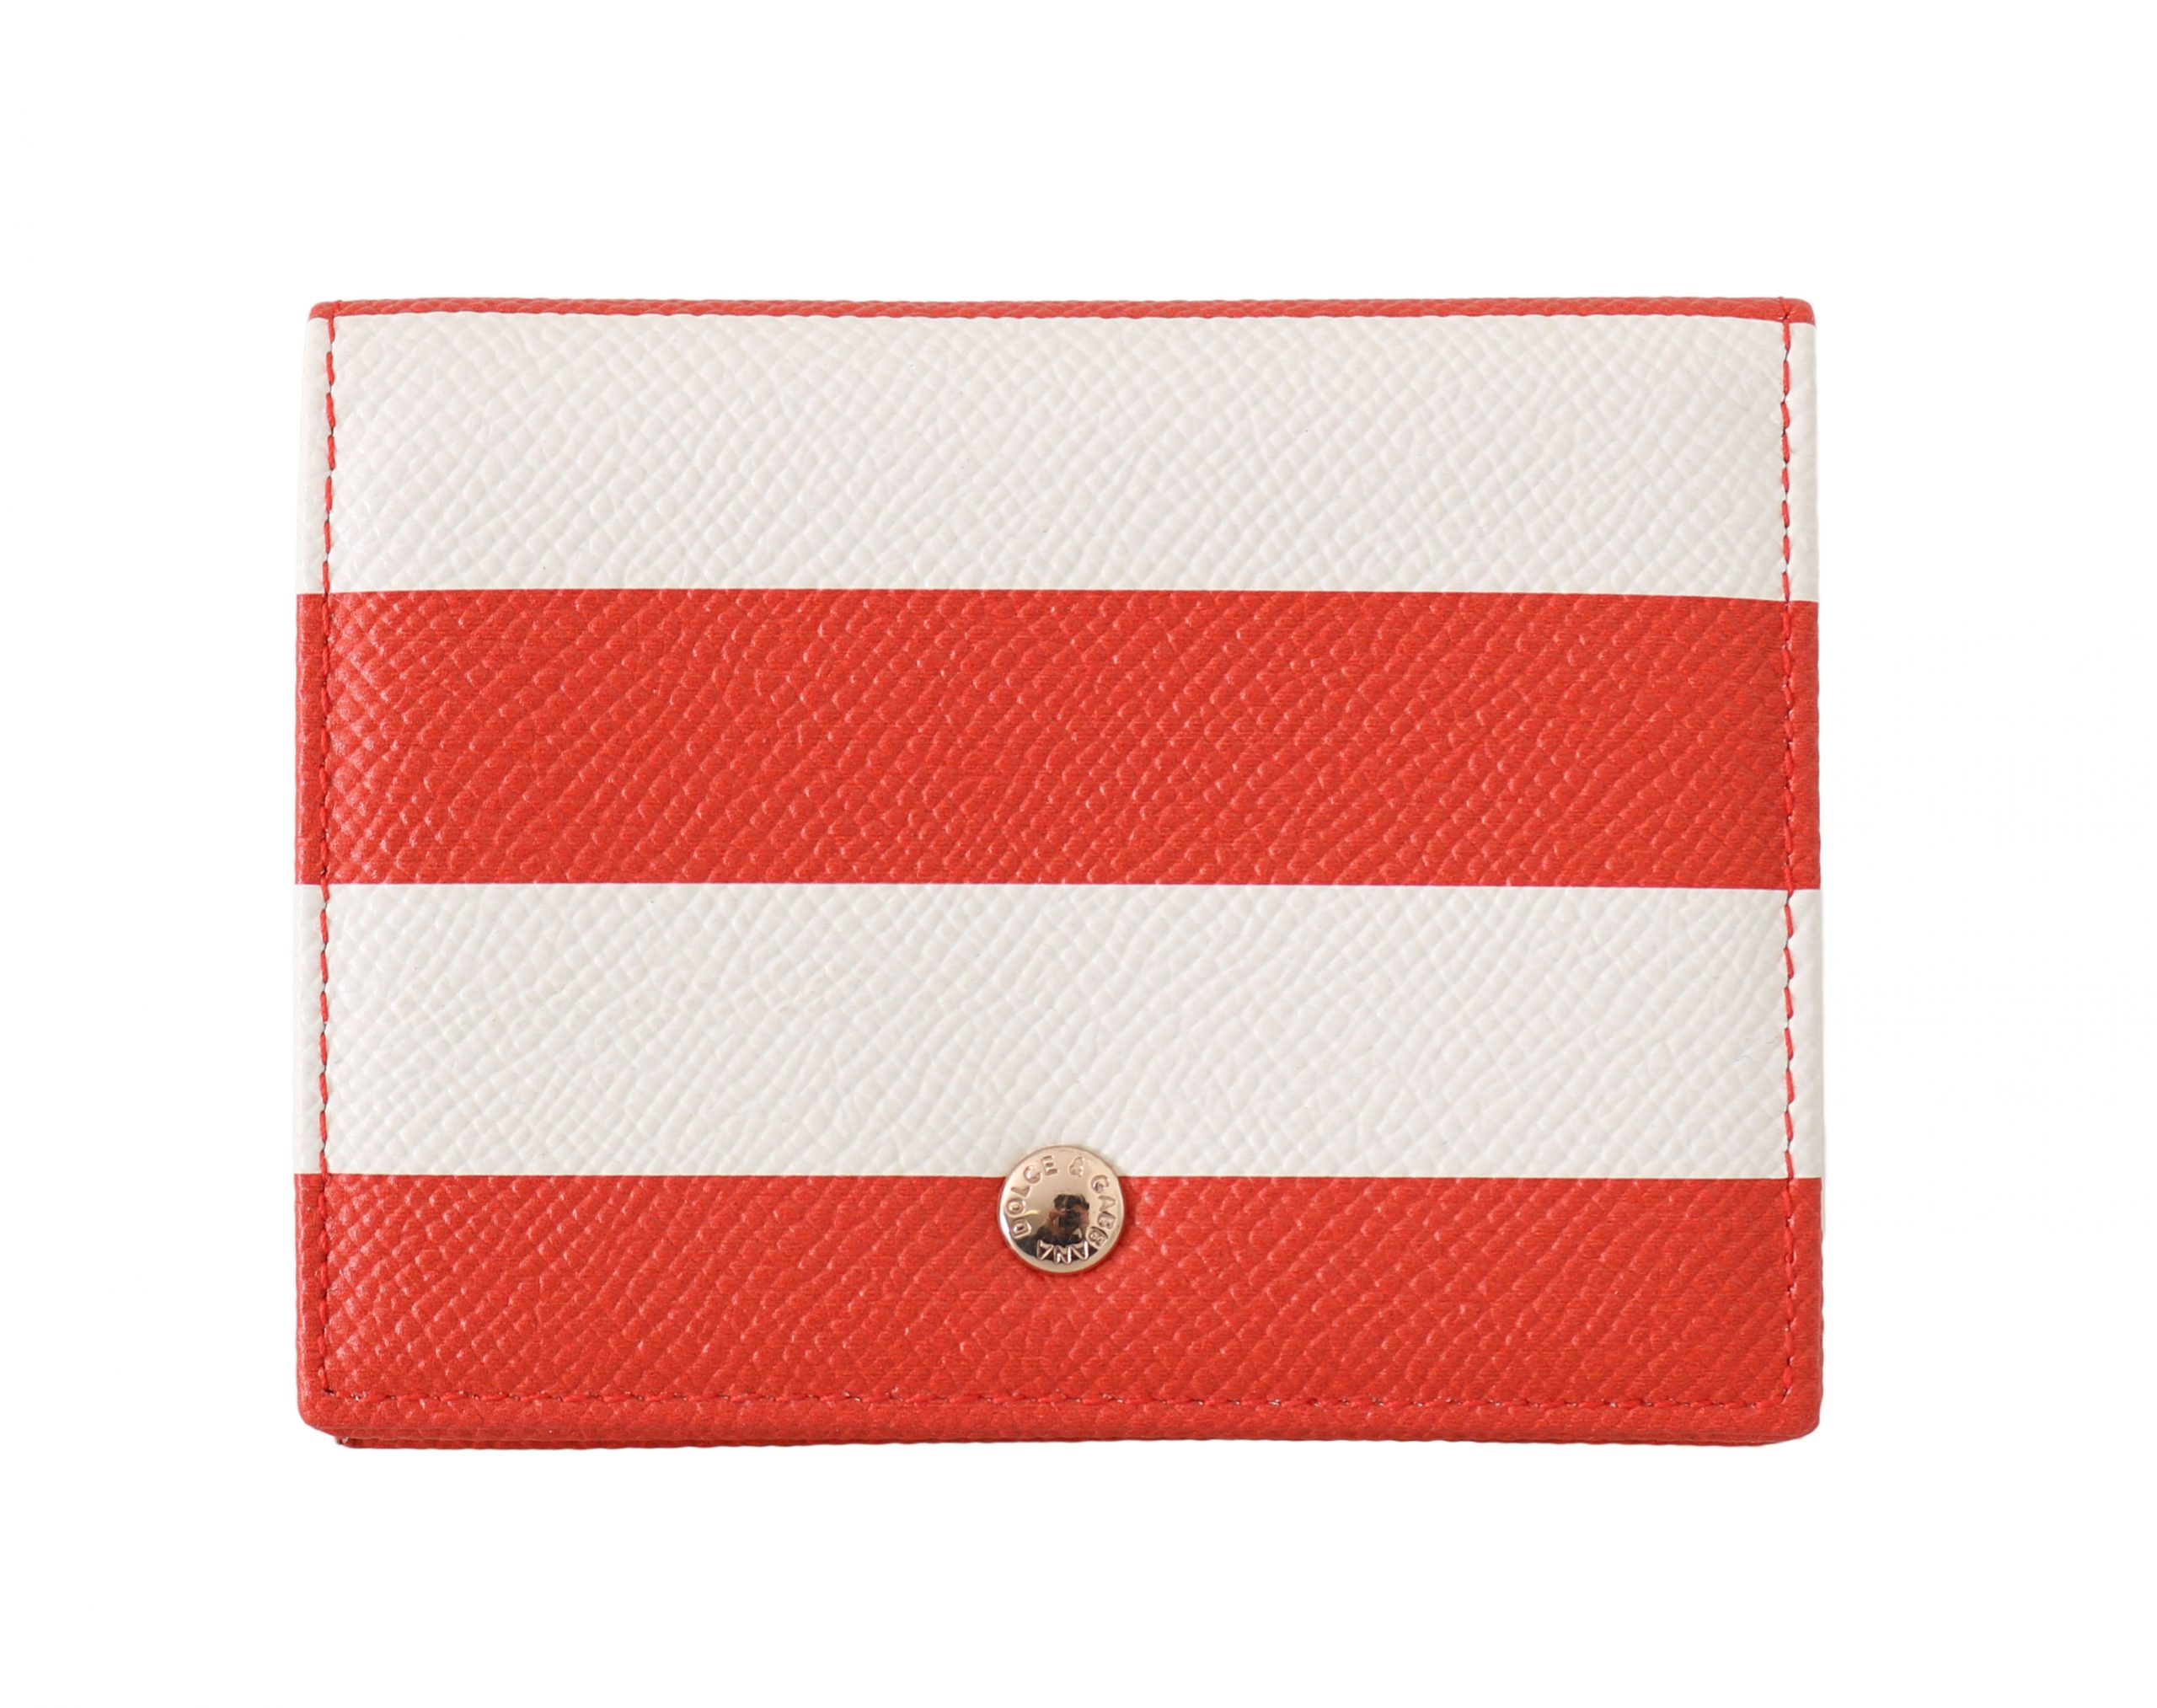 Dolce & Gabbana Women's Striped Leather Cardholder Wallet Red VAS15095